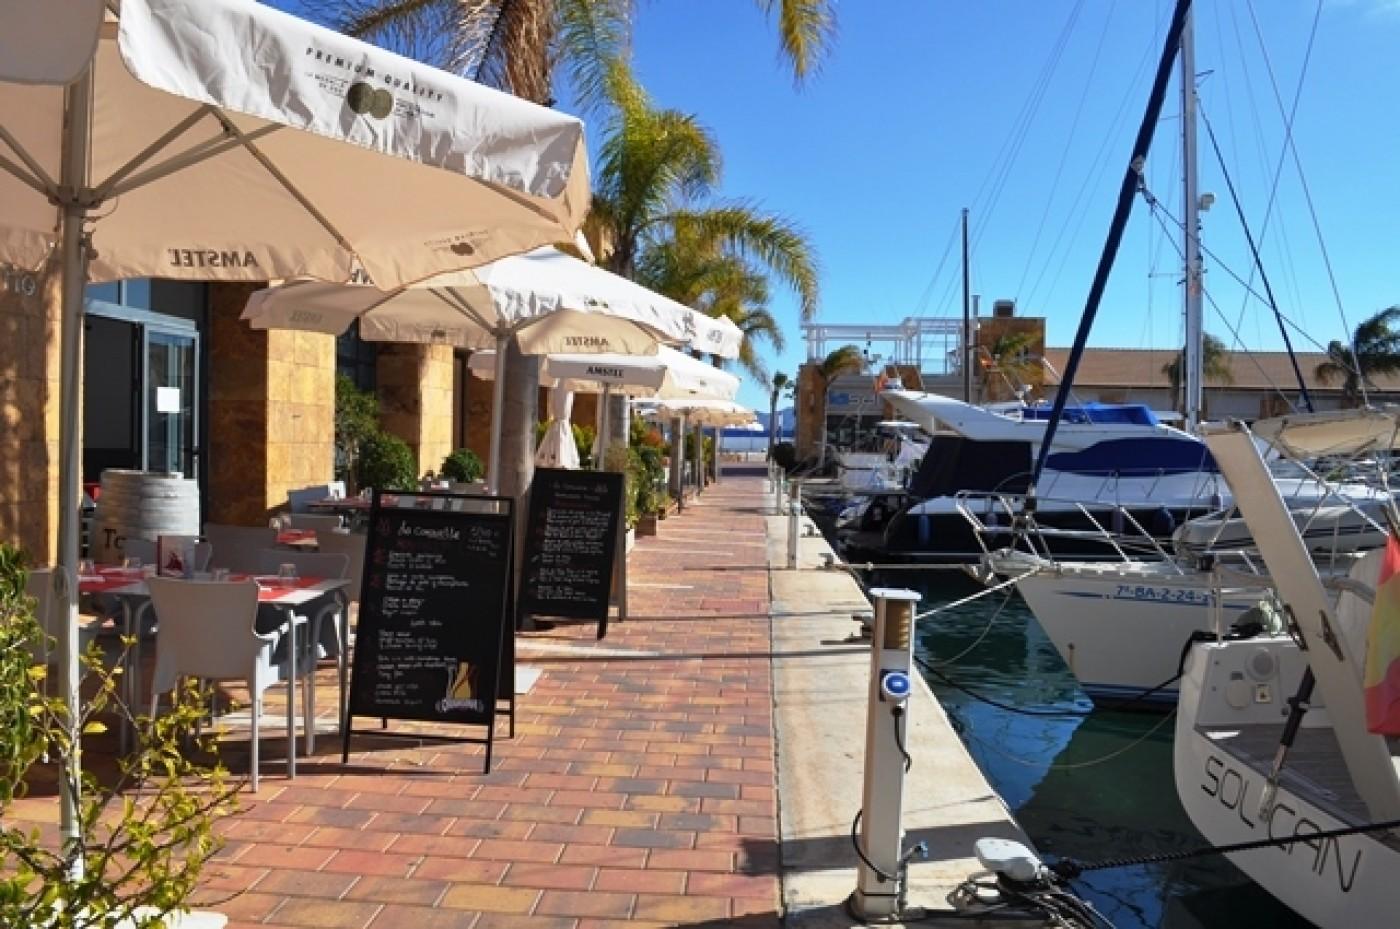 La Caravelle, French restaurant in the main marina of Puerto de Mazarrón